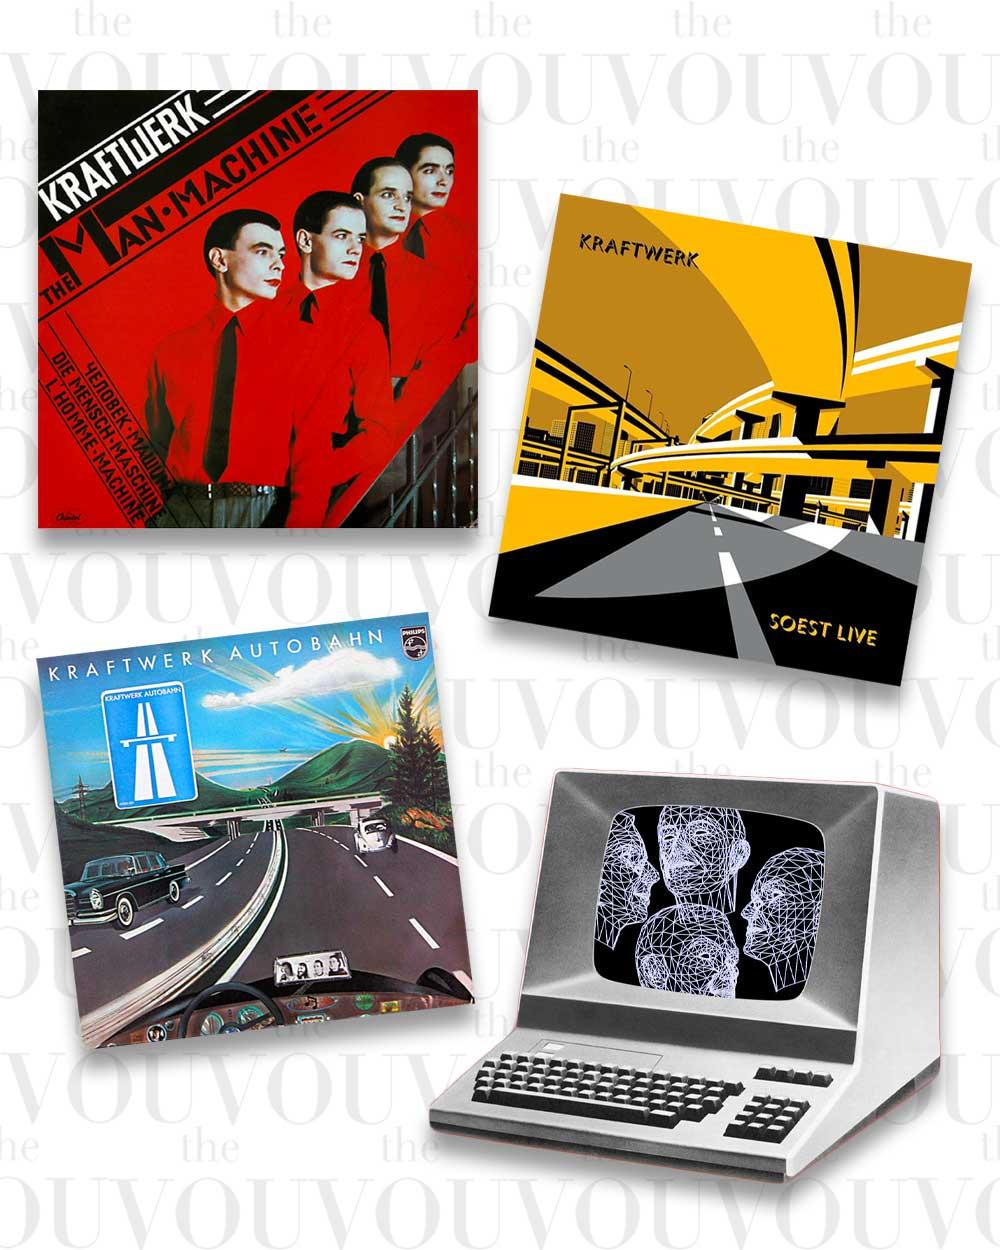 Retro Futurism Aesthetic by Kraftwerk 1970s albums